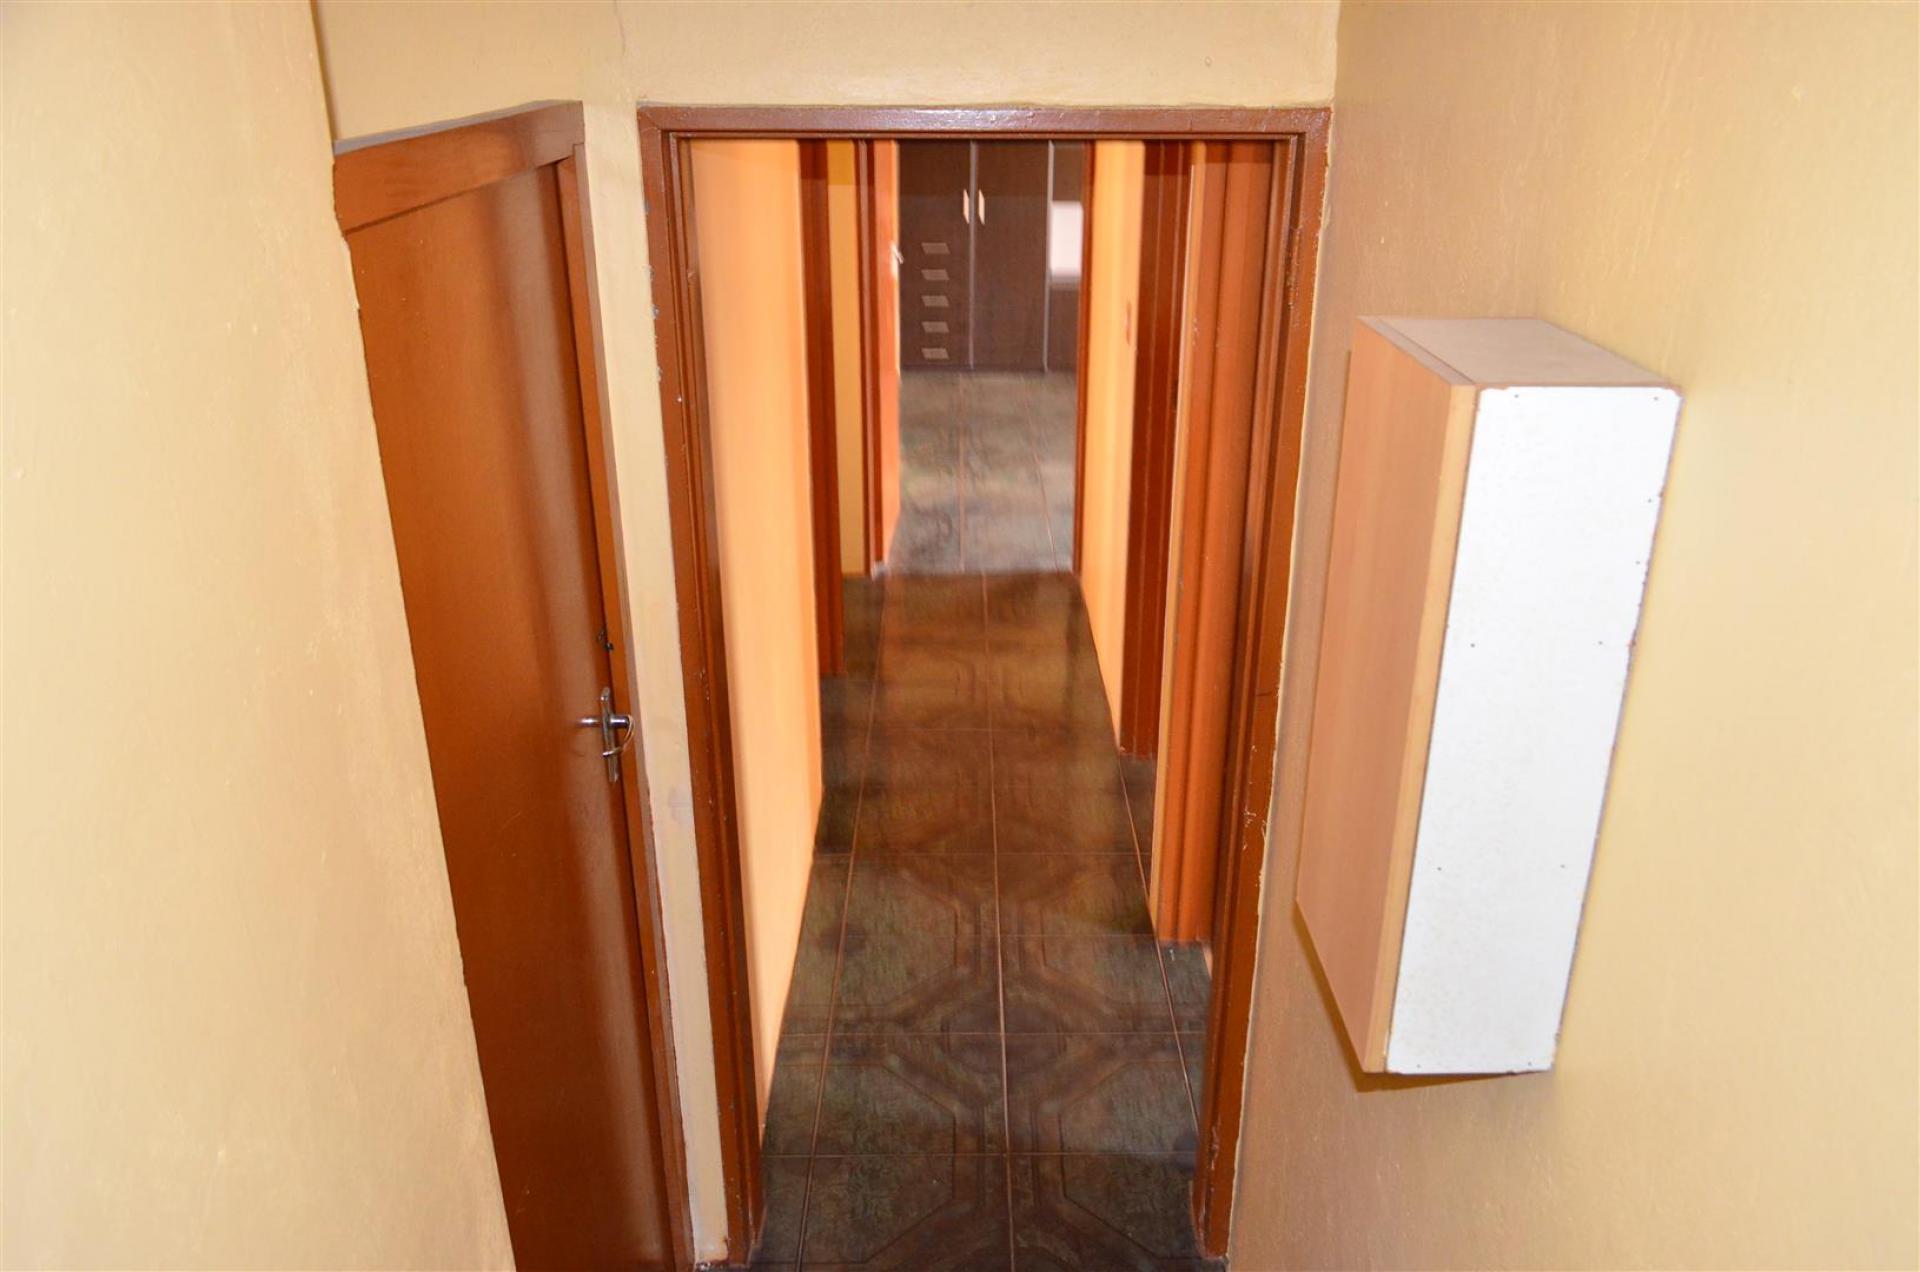 Storage Space Durban North Vawda Bedroom Study Unit With